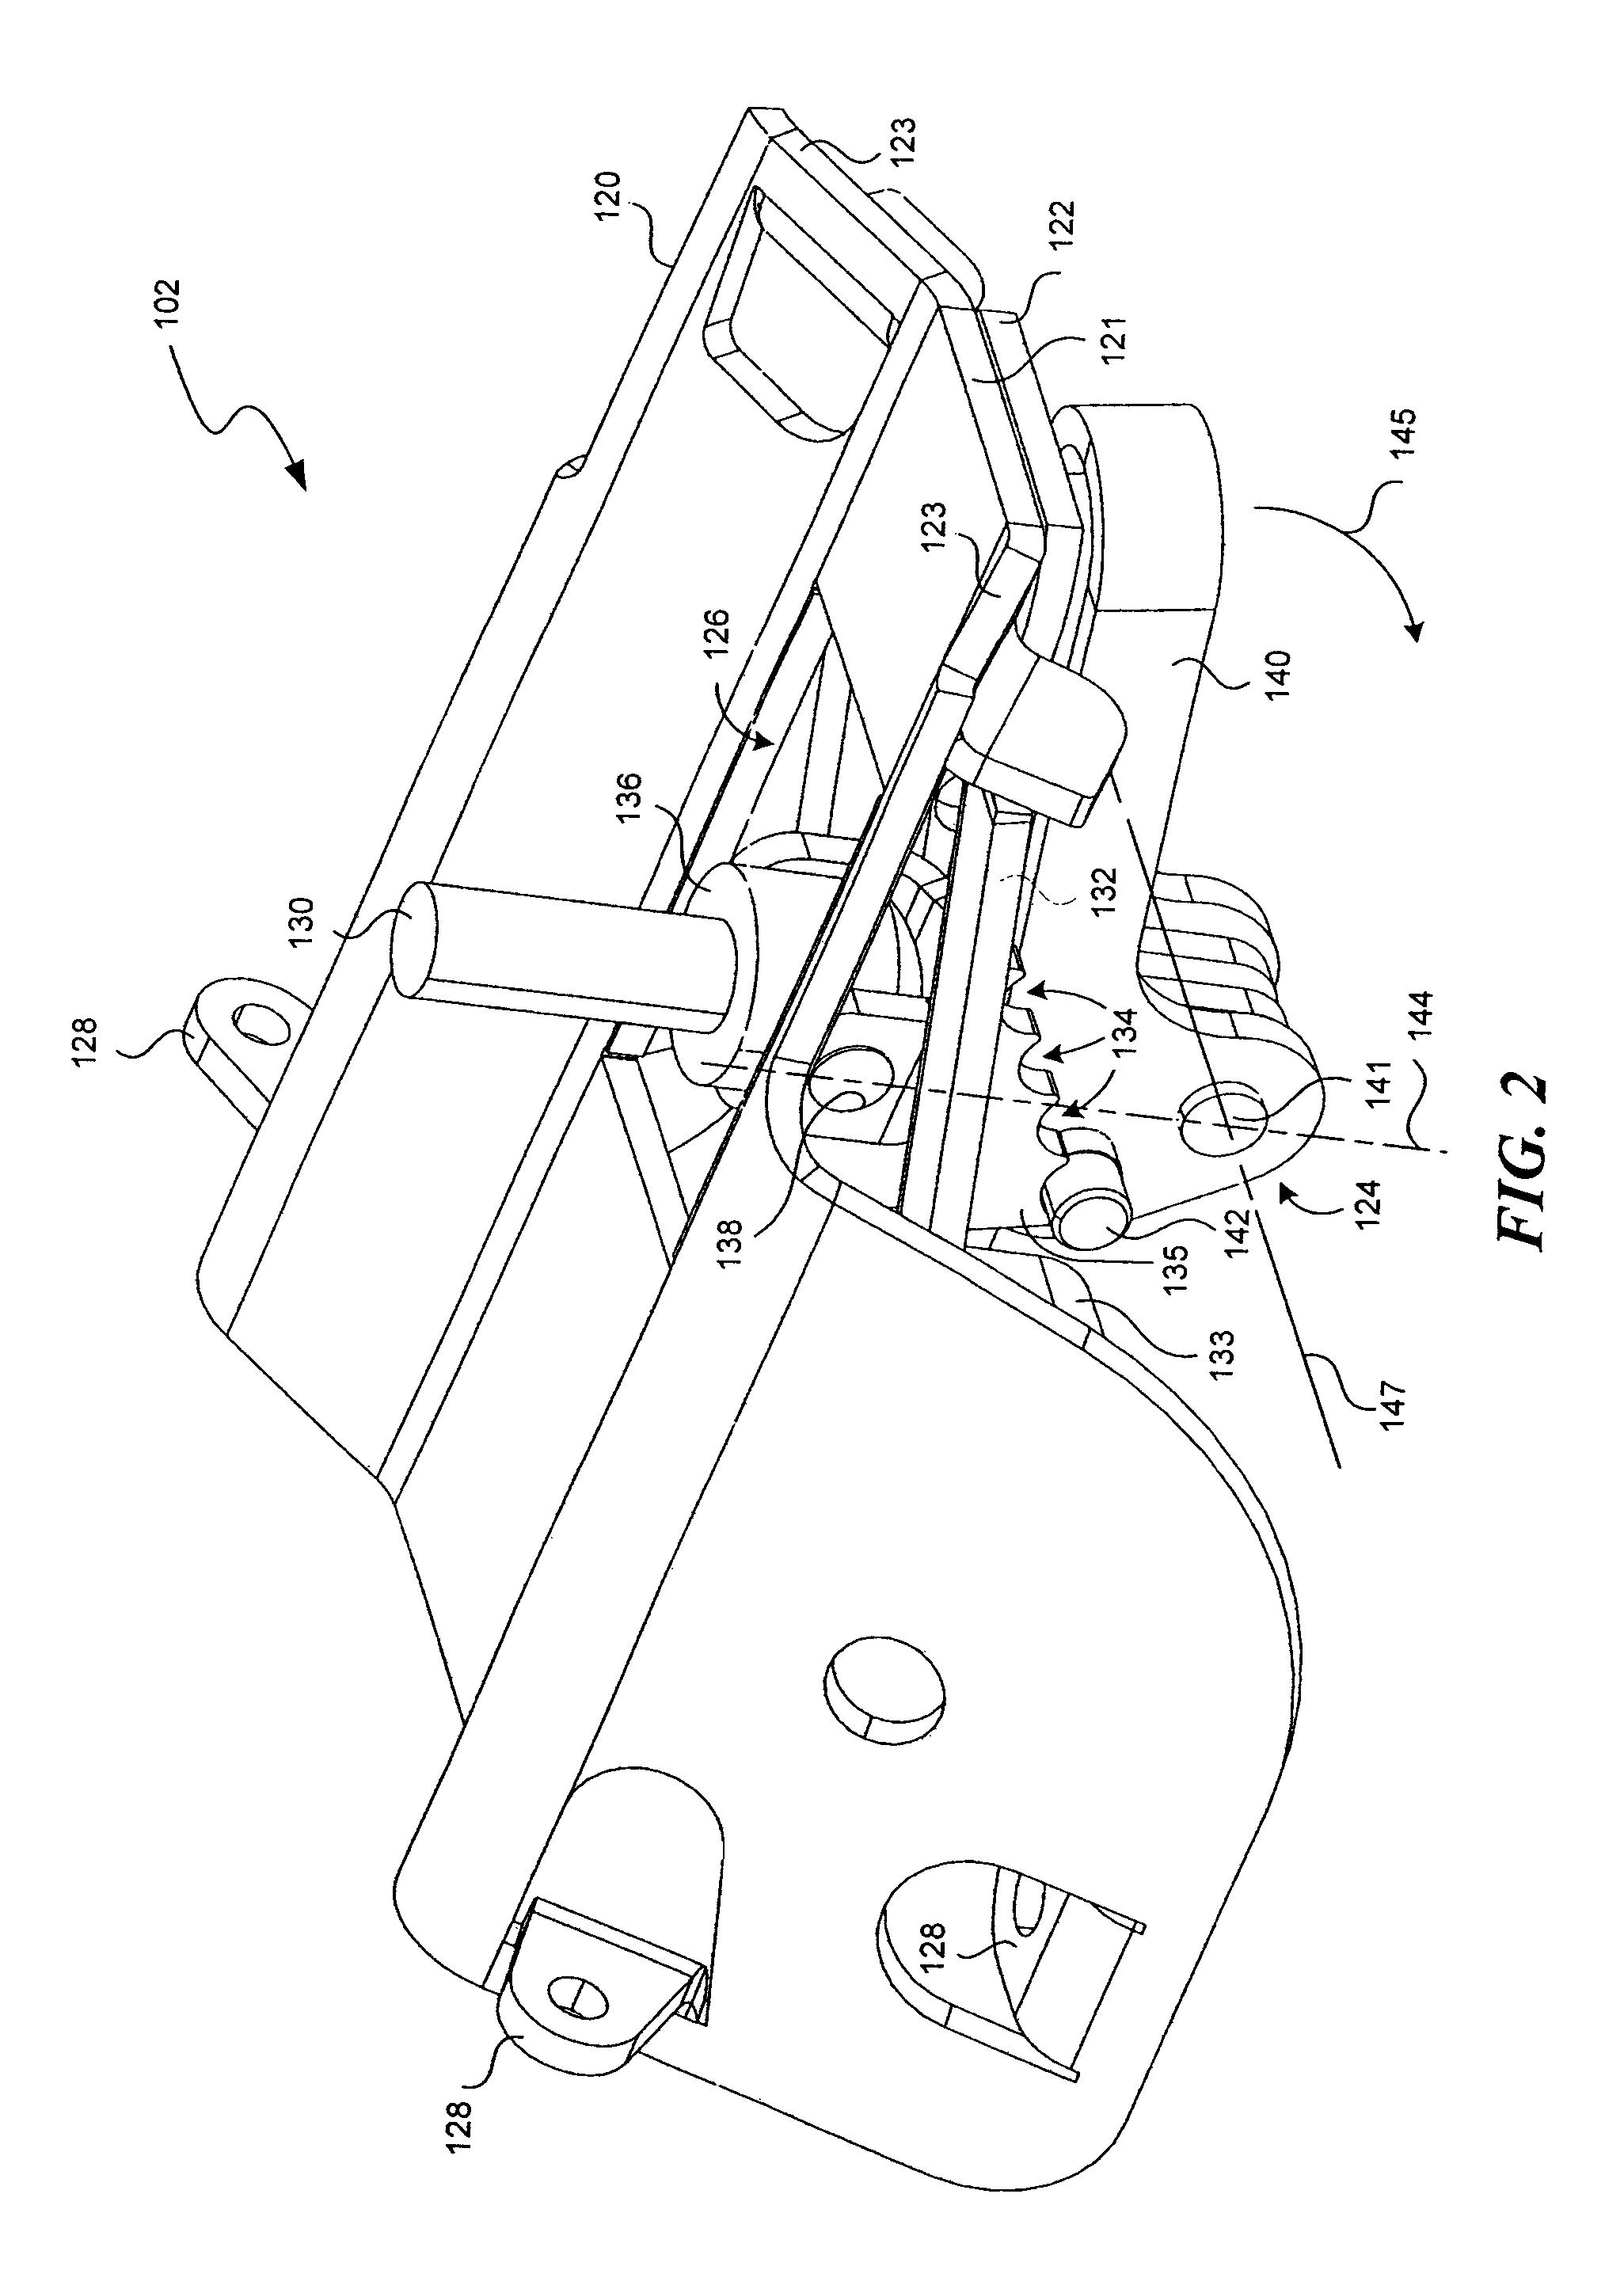 Patent Images ·: Mey Ferguson 135 Wiring Diagram At Chusao.net